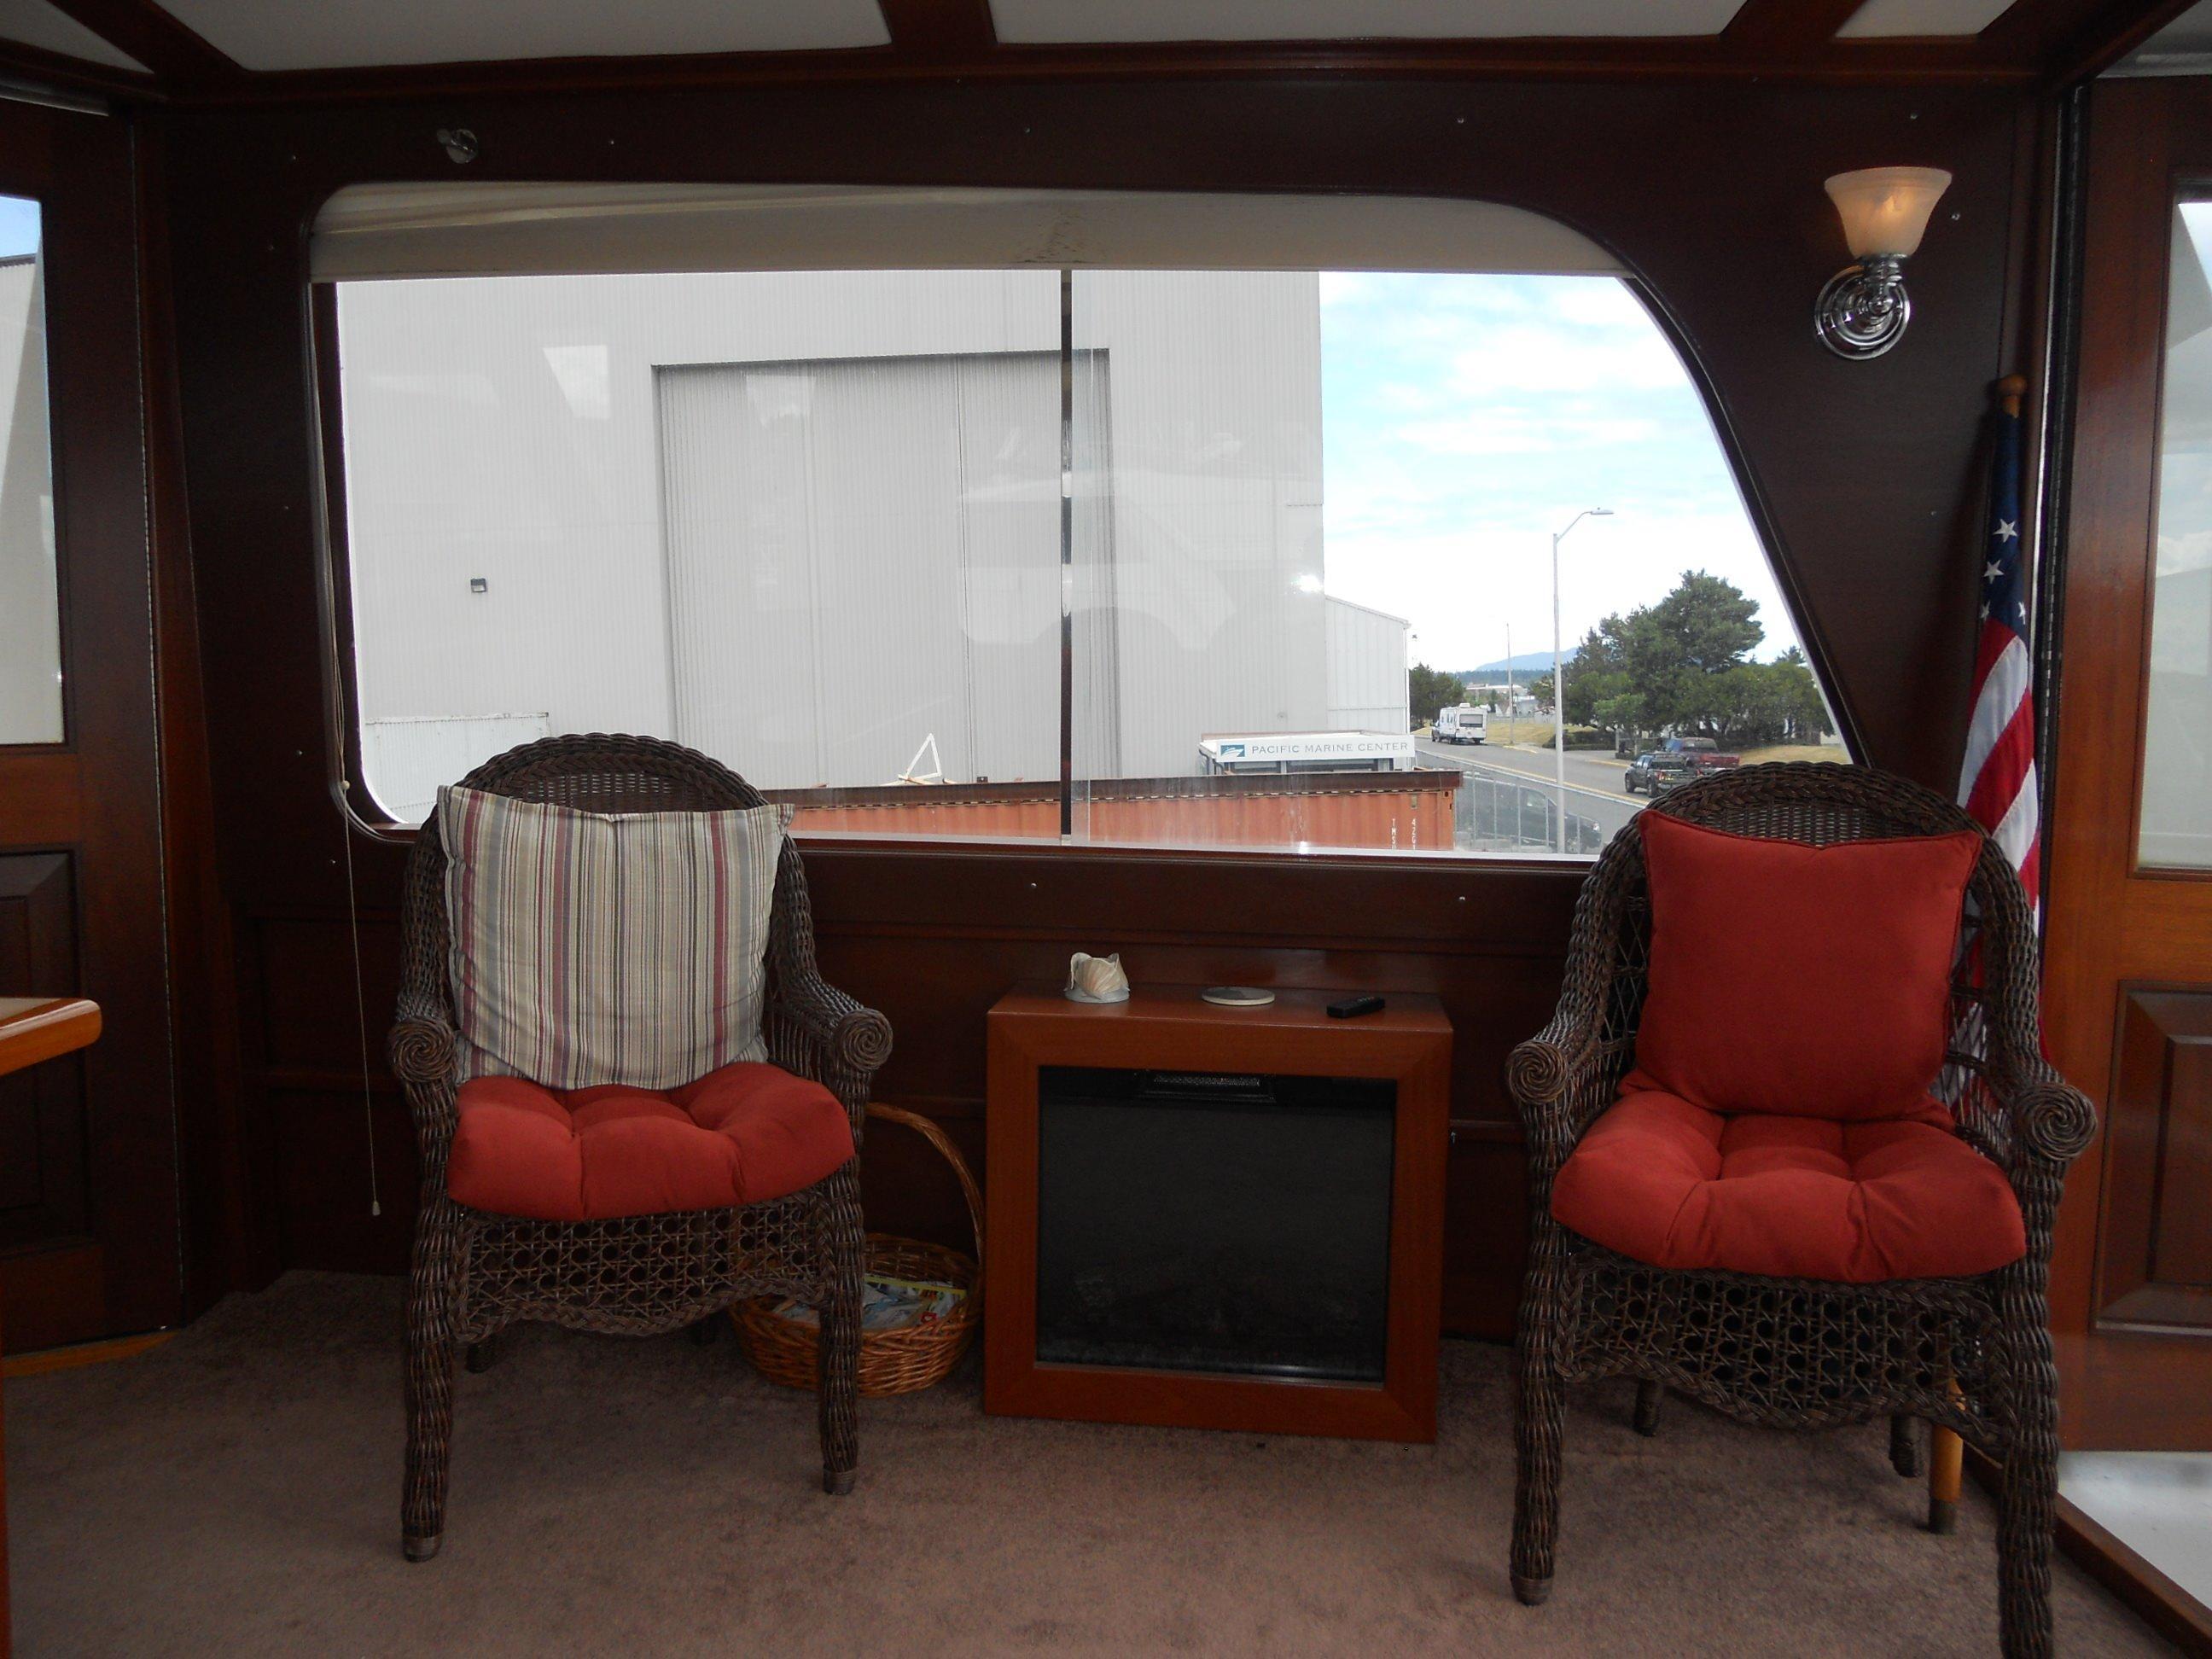 Salon seating & fireplace